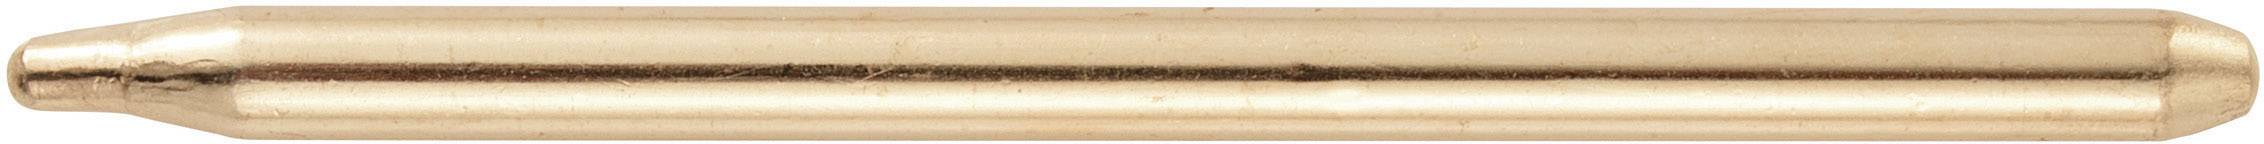 Teplovodná trubka Gelid CP-S6100-01, (Ø x d) 6 mm x 100 mm, měď, voda